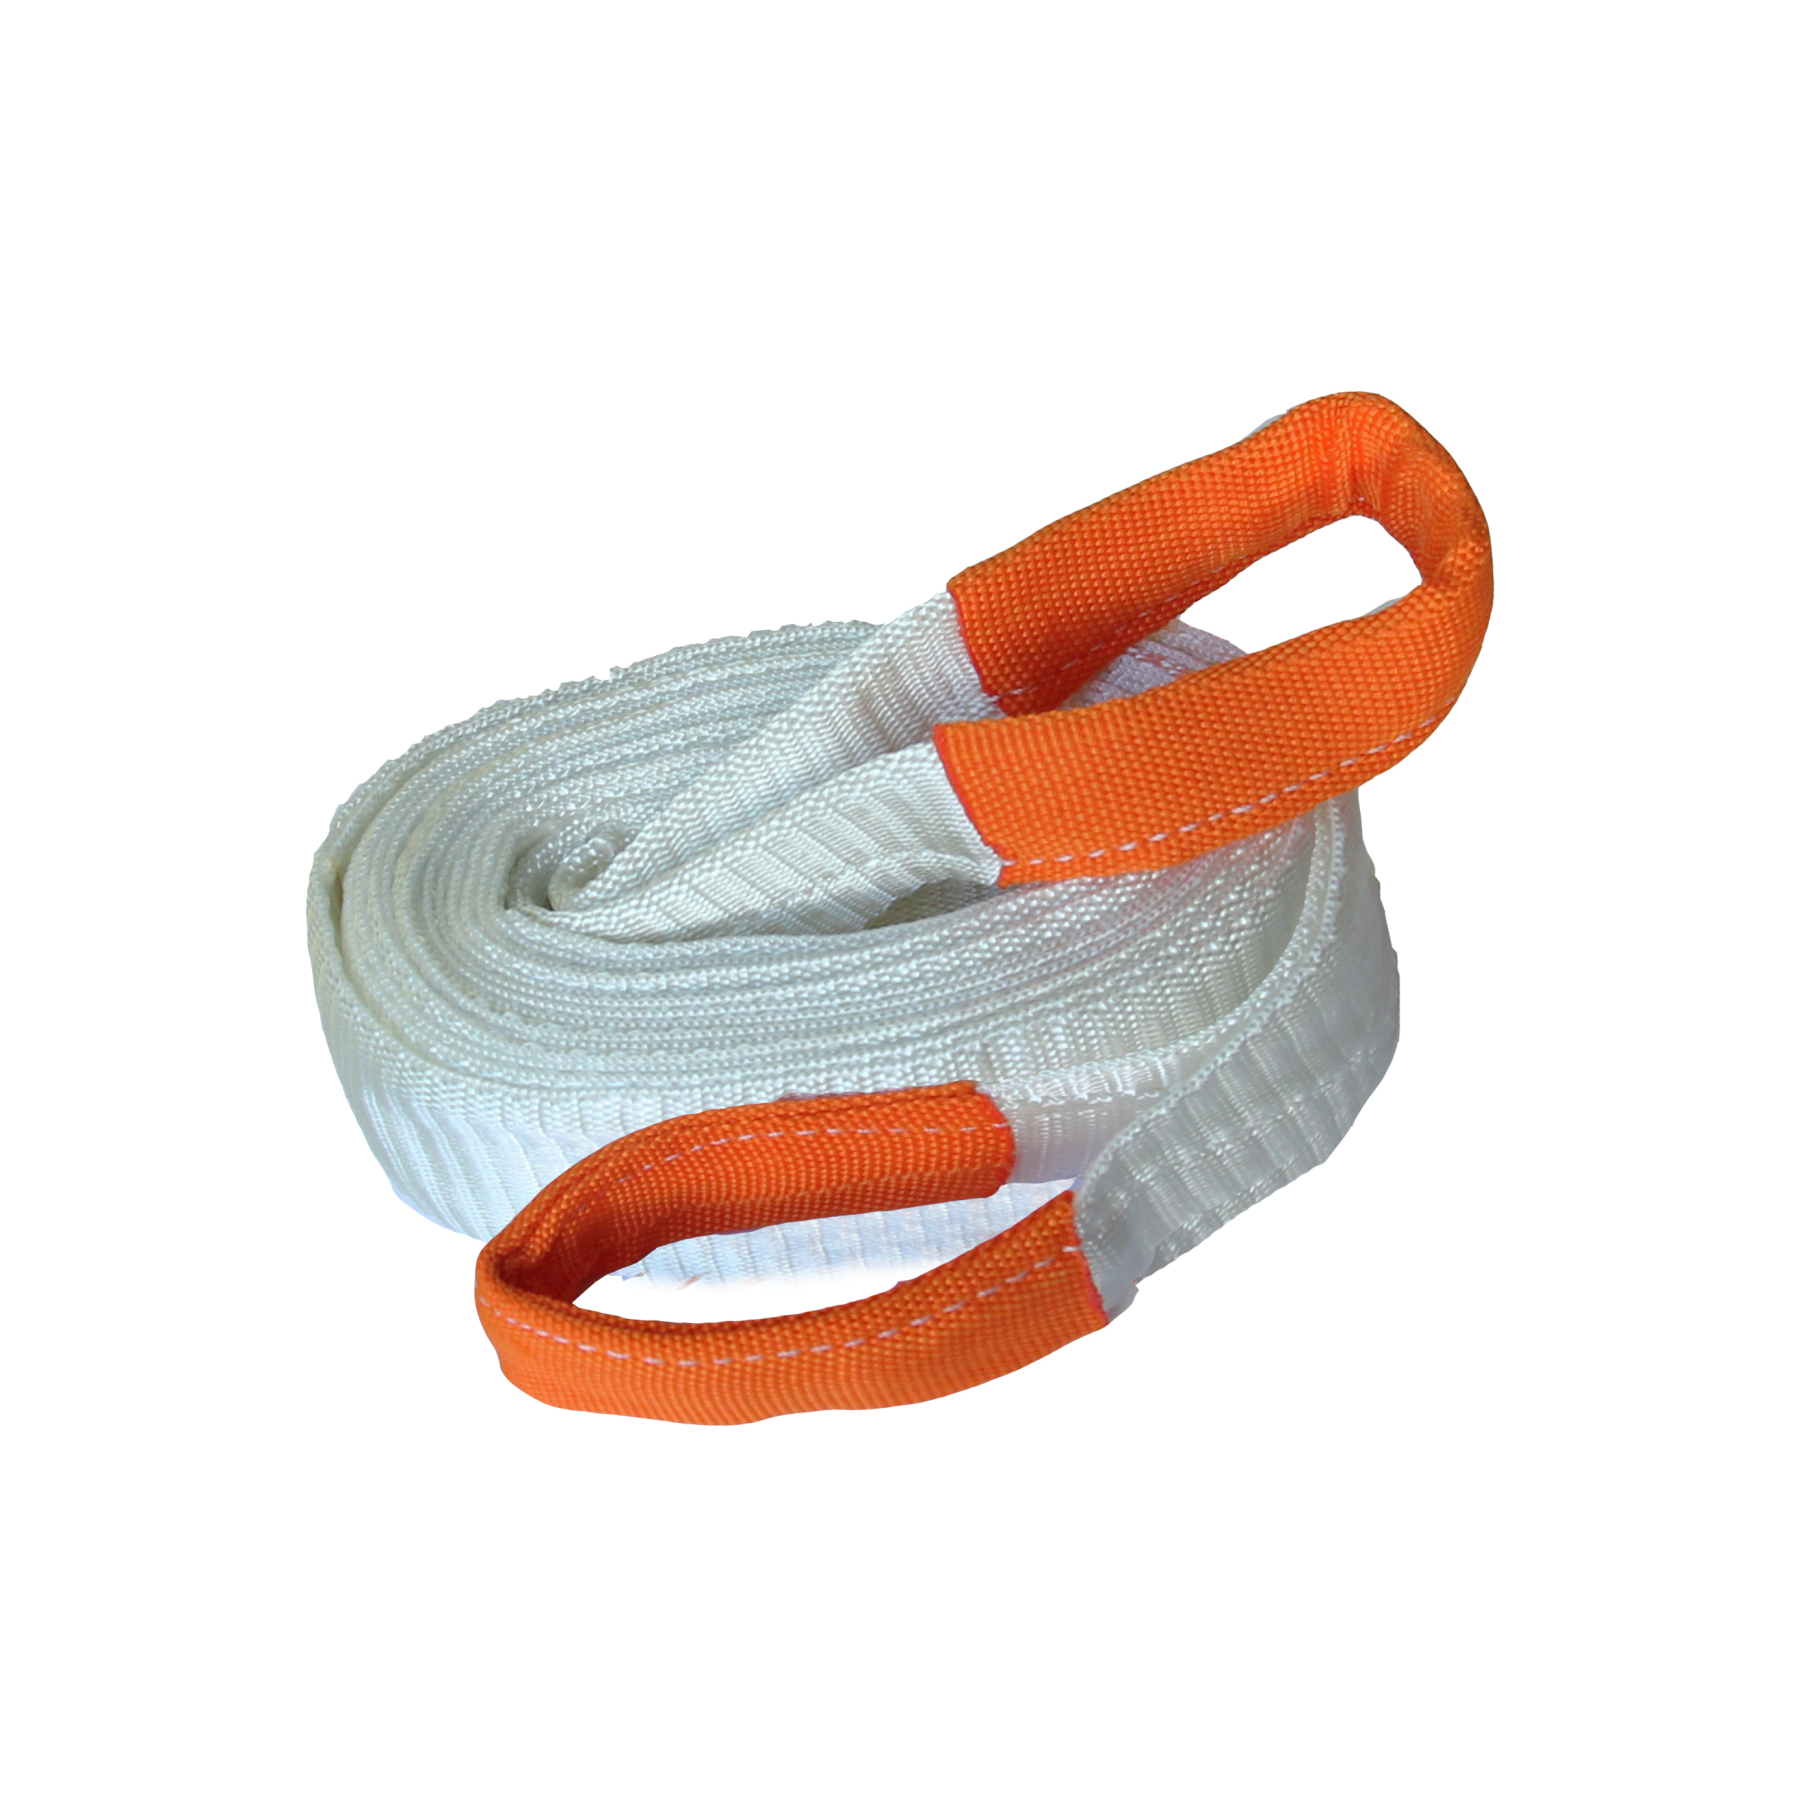 Rope (dynamic Slings) 6 M (6 T) Width 60mm